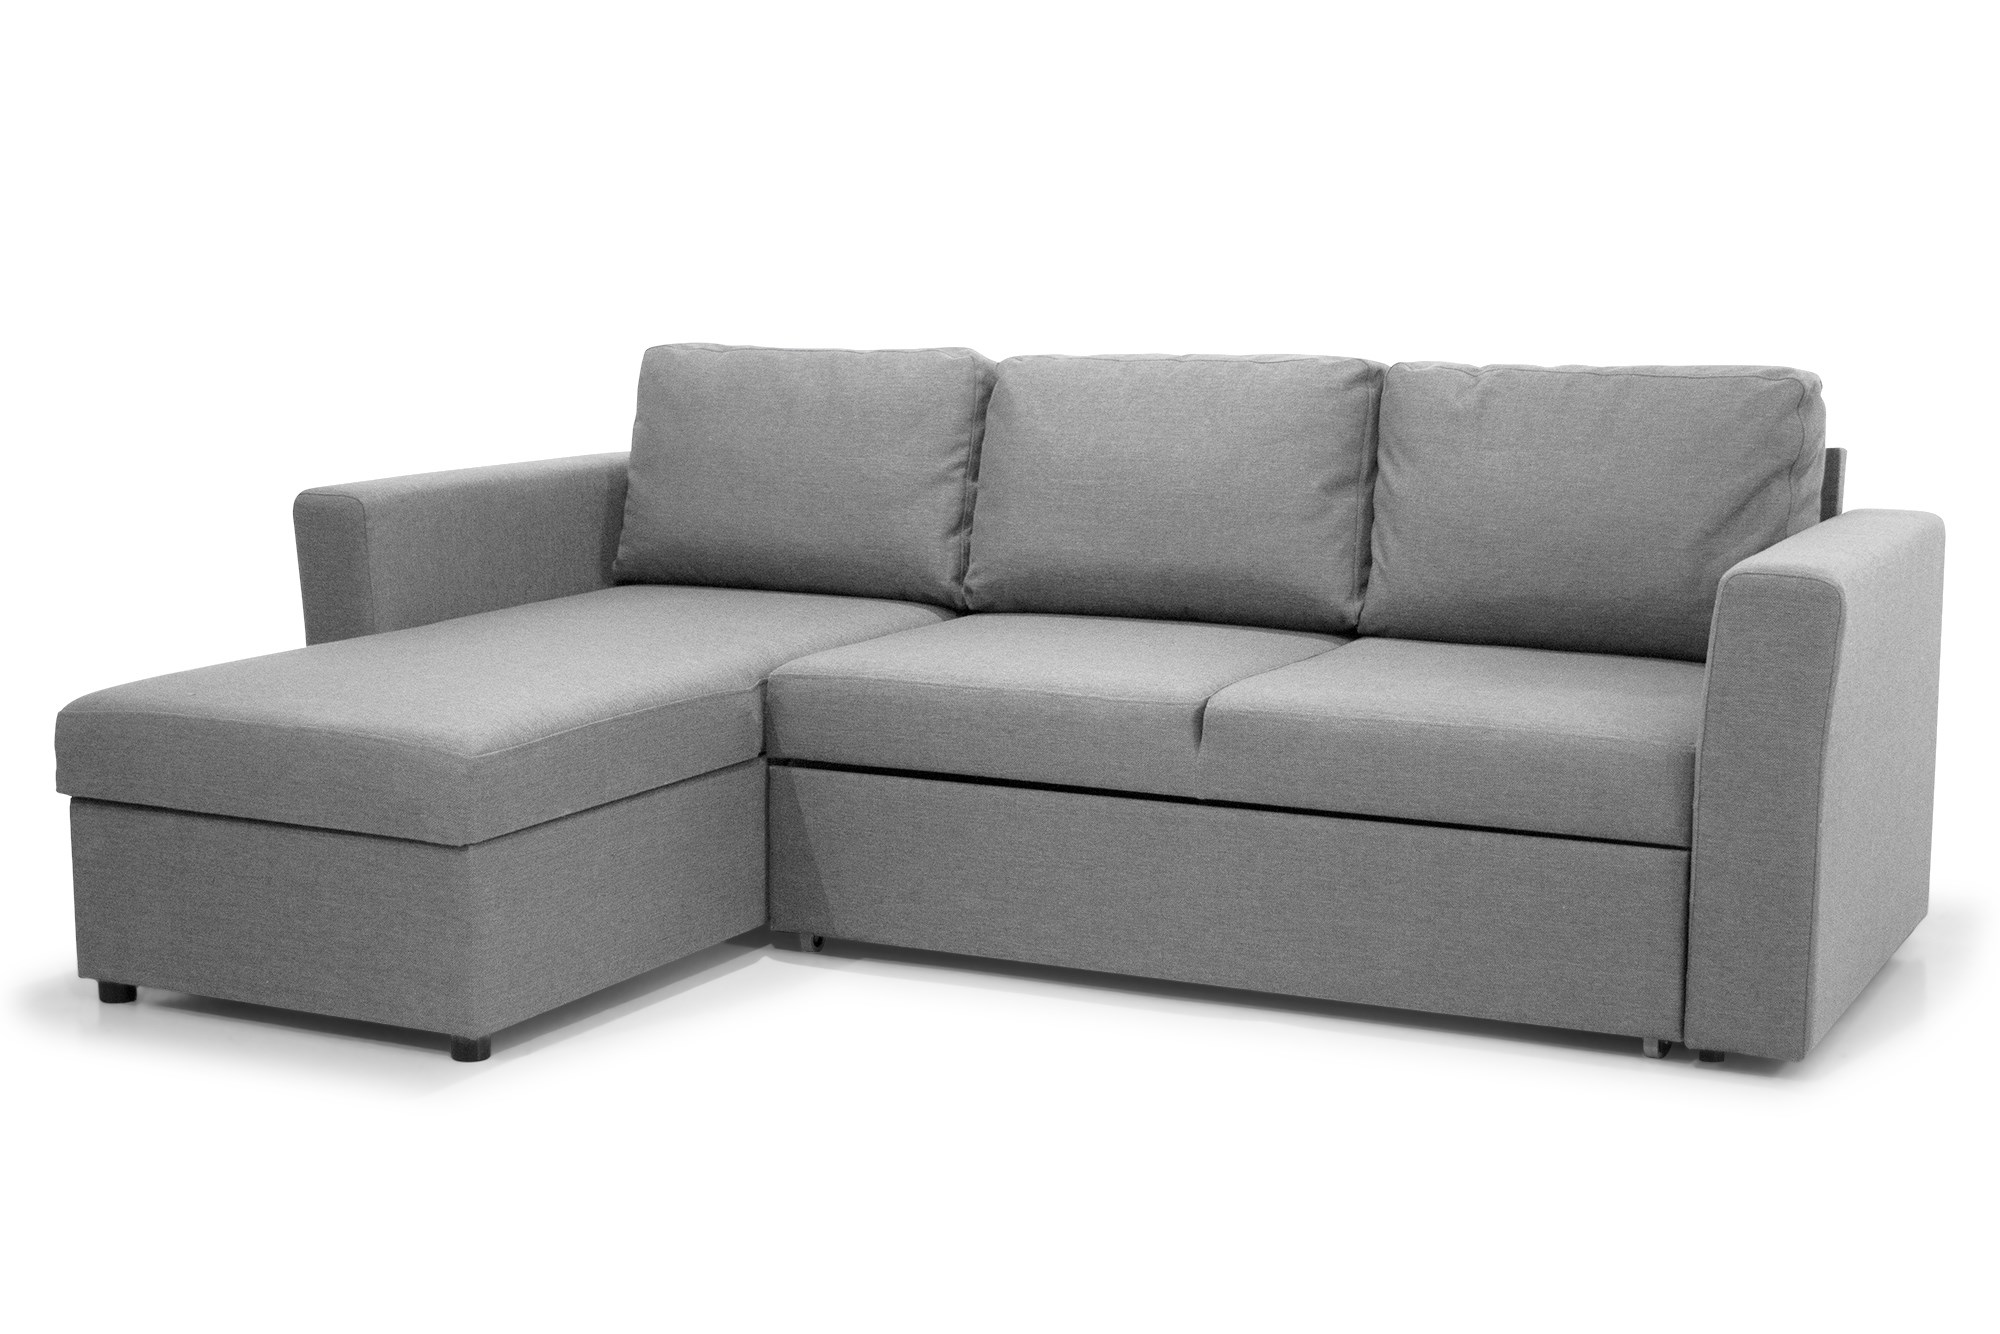 Sofa med chaiselong Find din næste chaiselongsofa her!